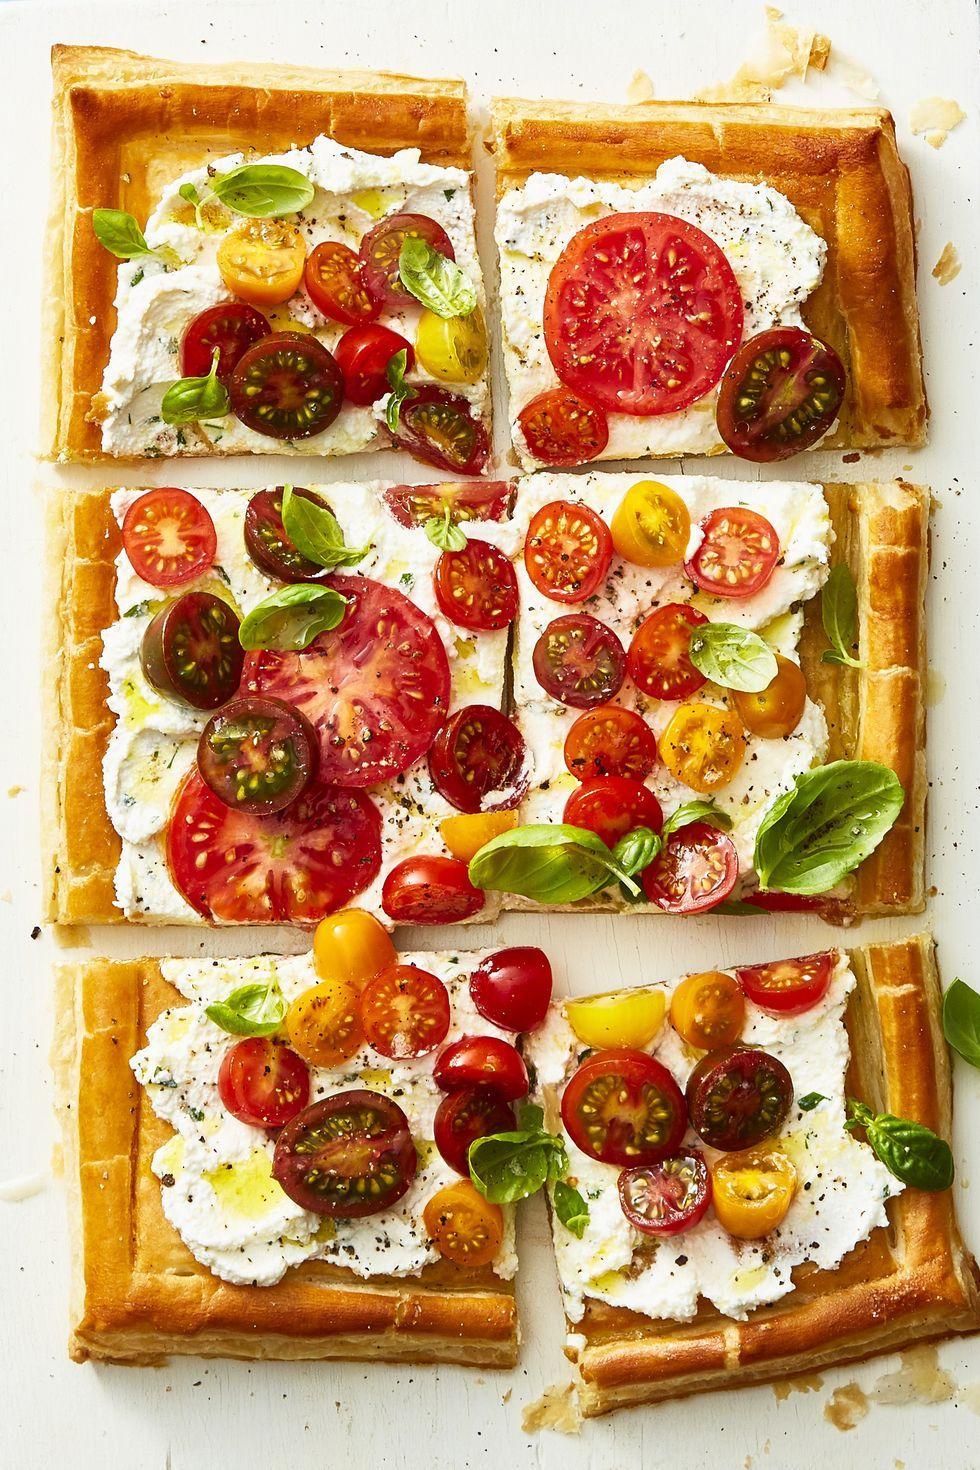 Herbed Ricotta and Fresh Tomato Tart